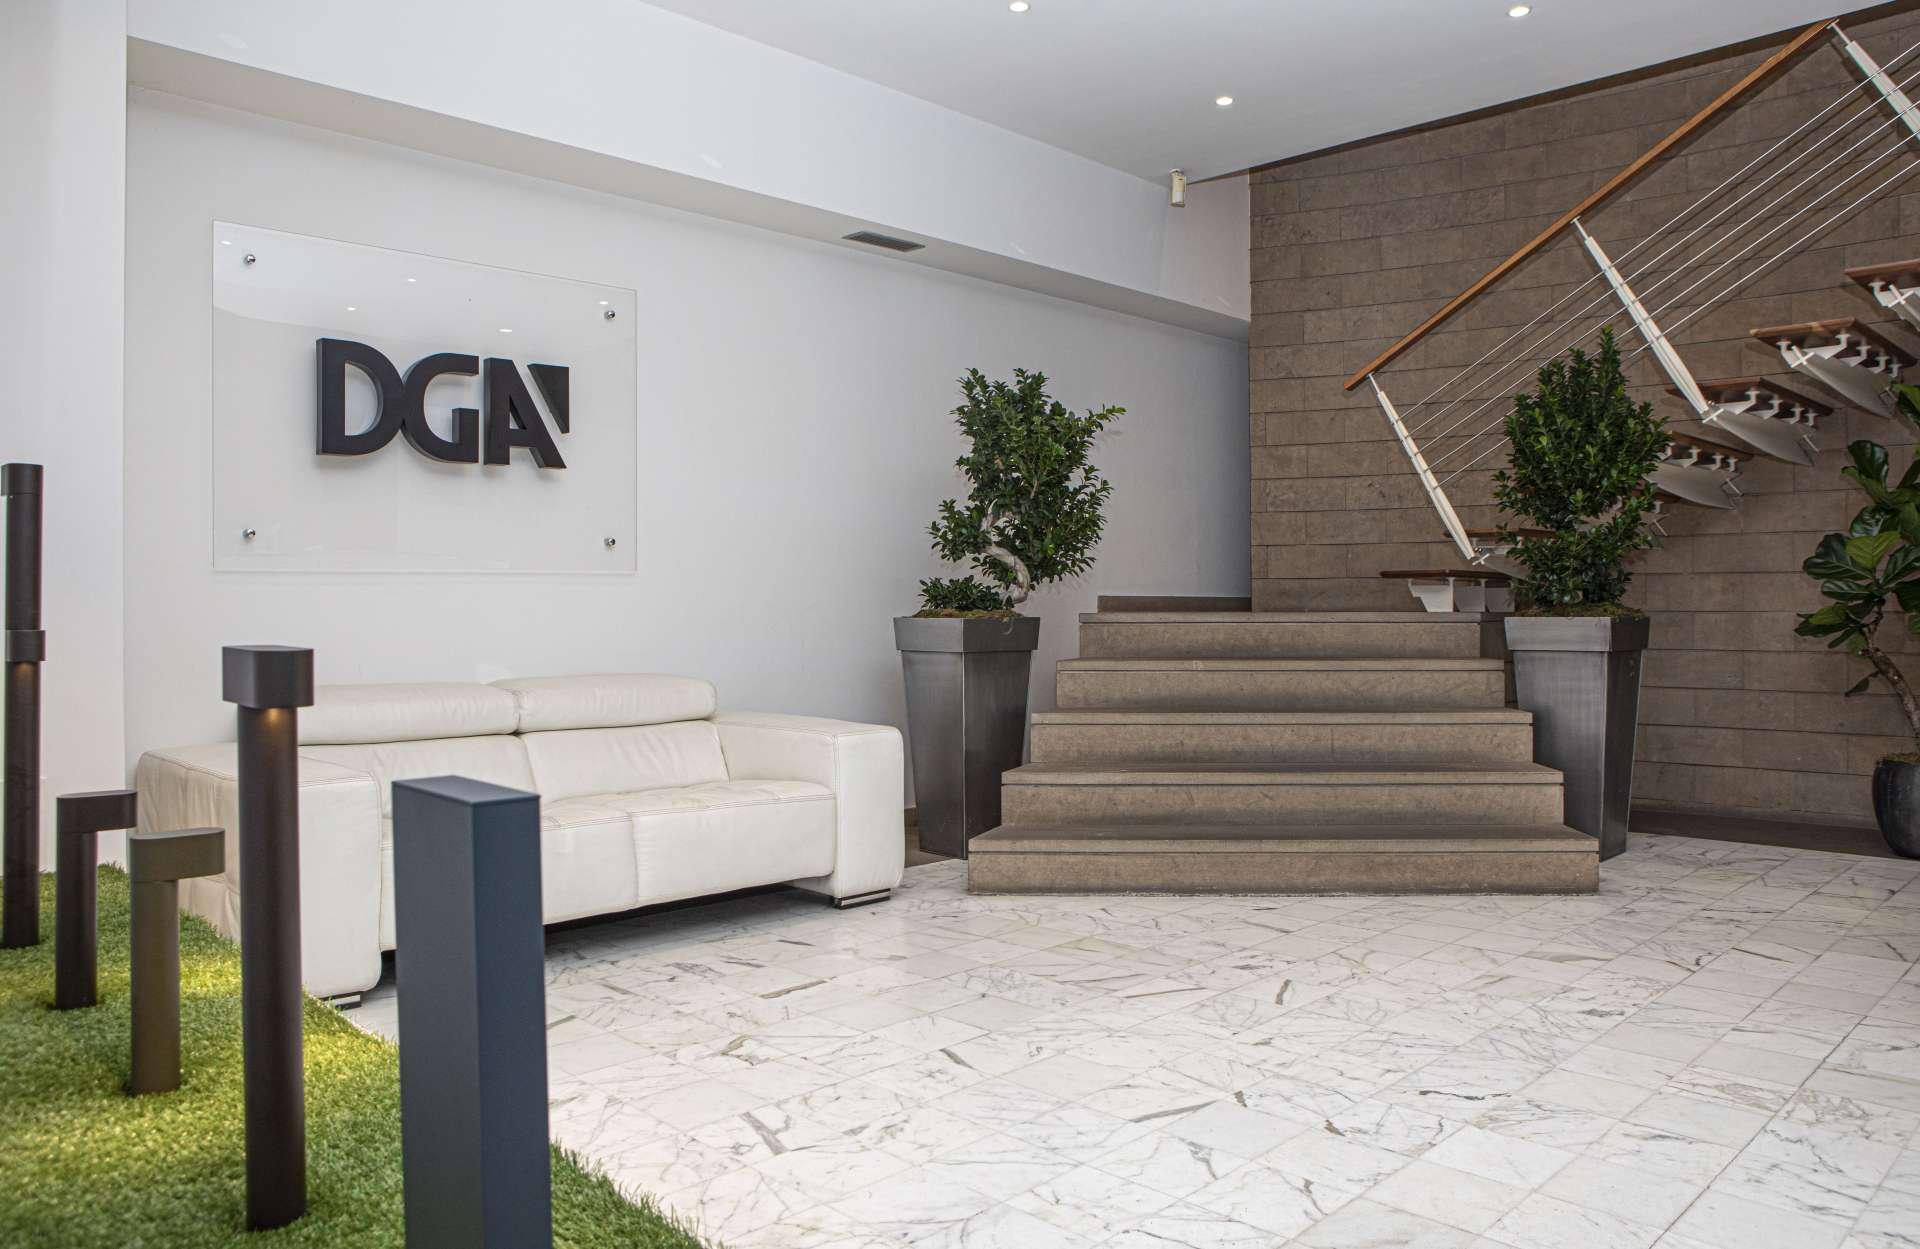 #Impresando in DGA